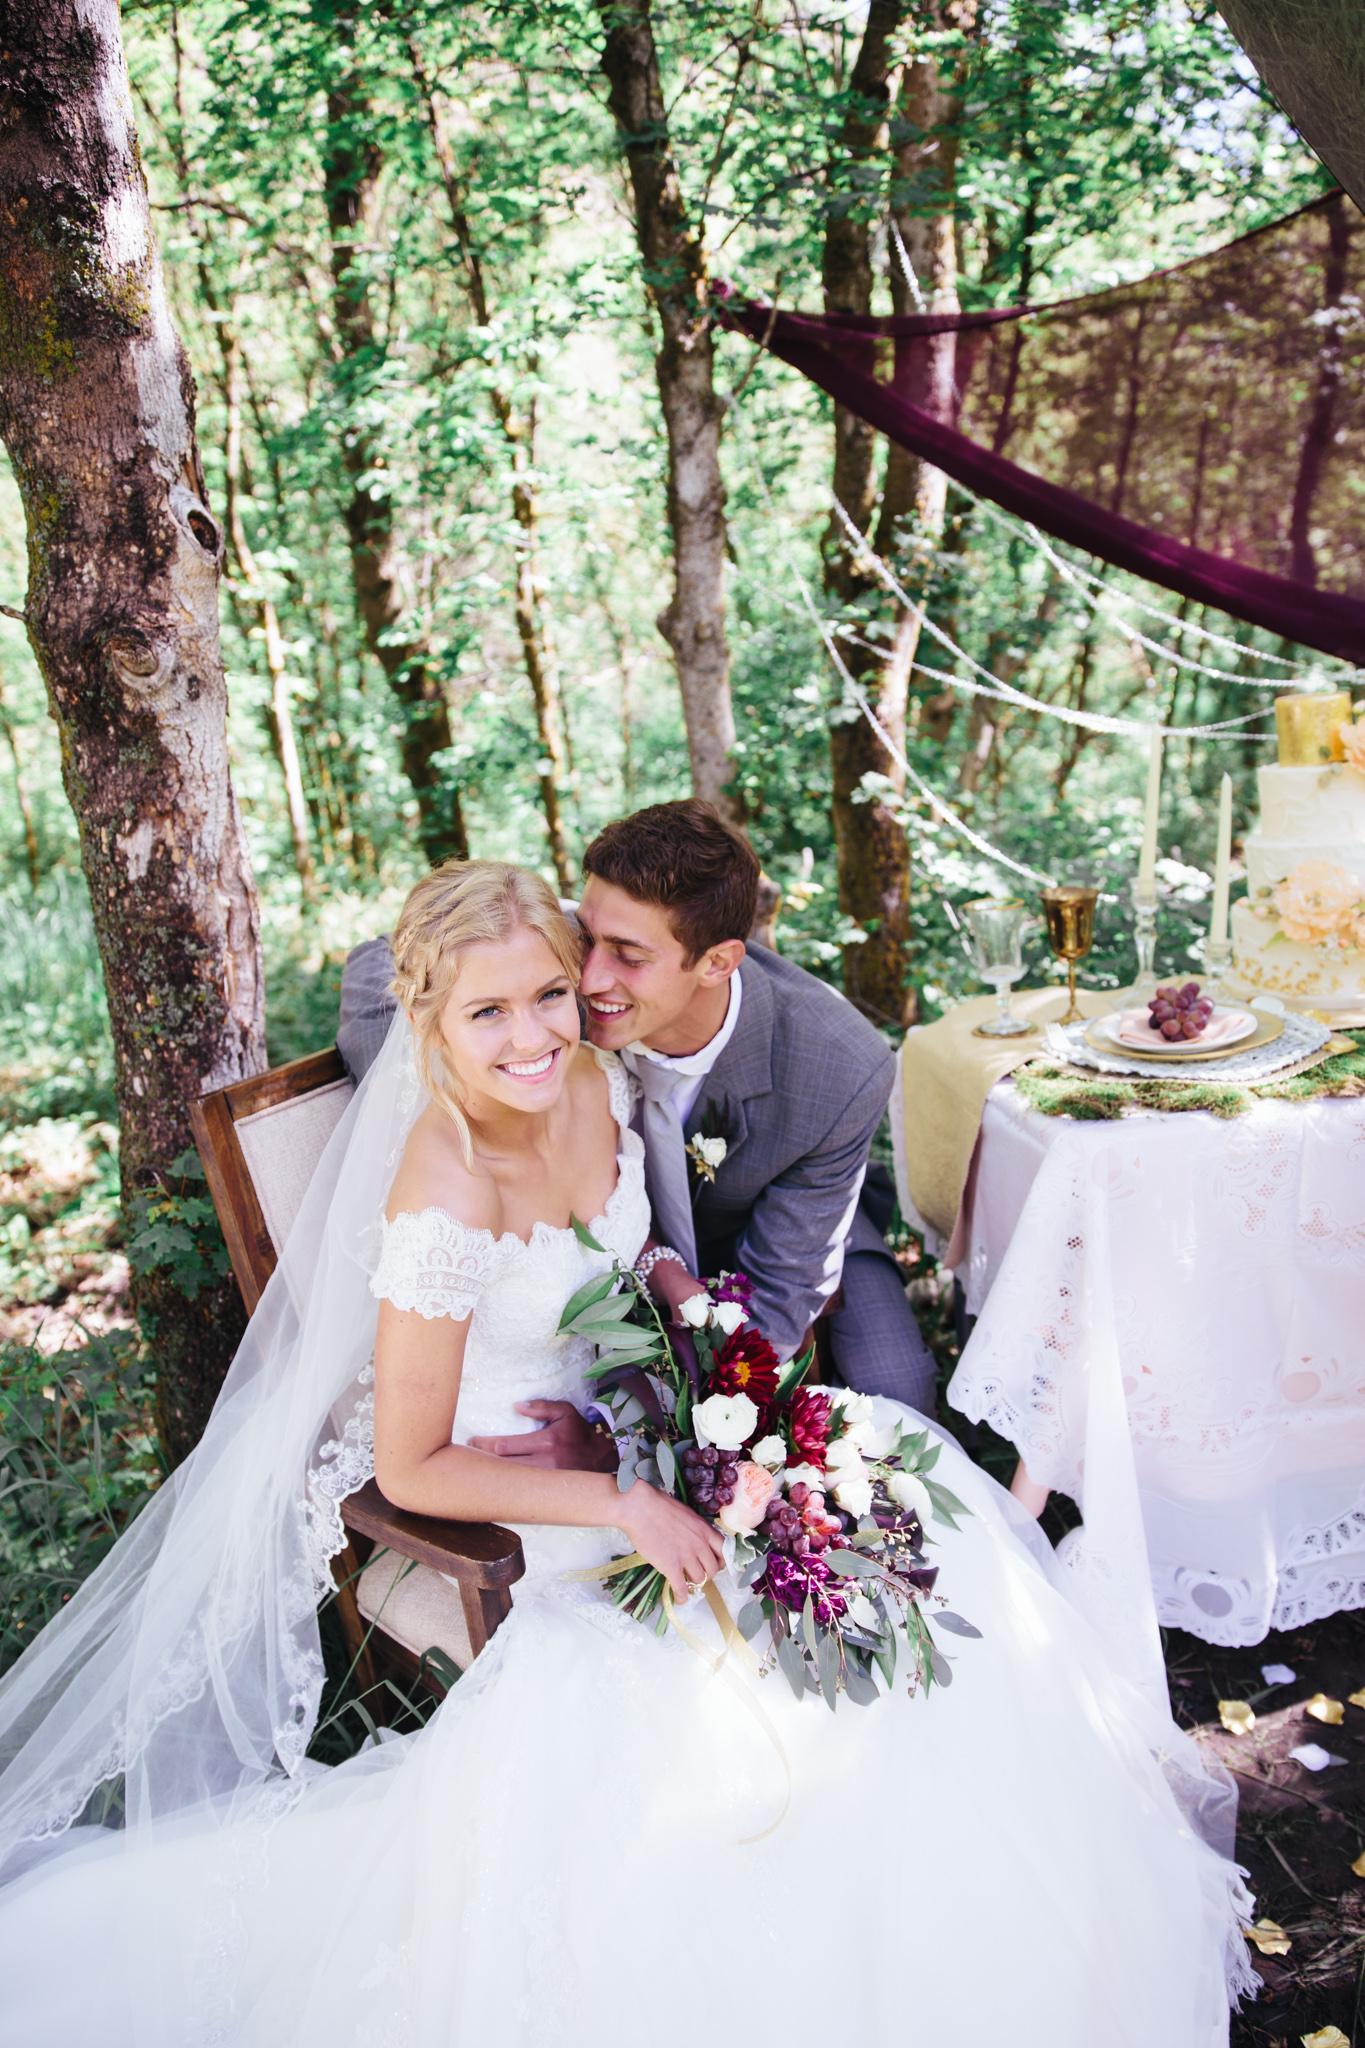 cami_kaye_photography_bridal_photographer-21.jpg